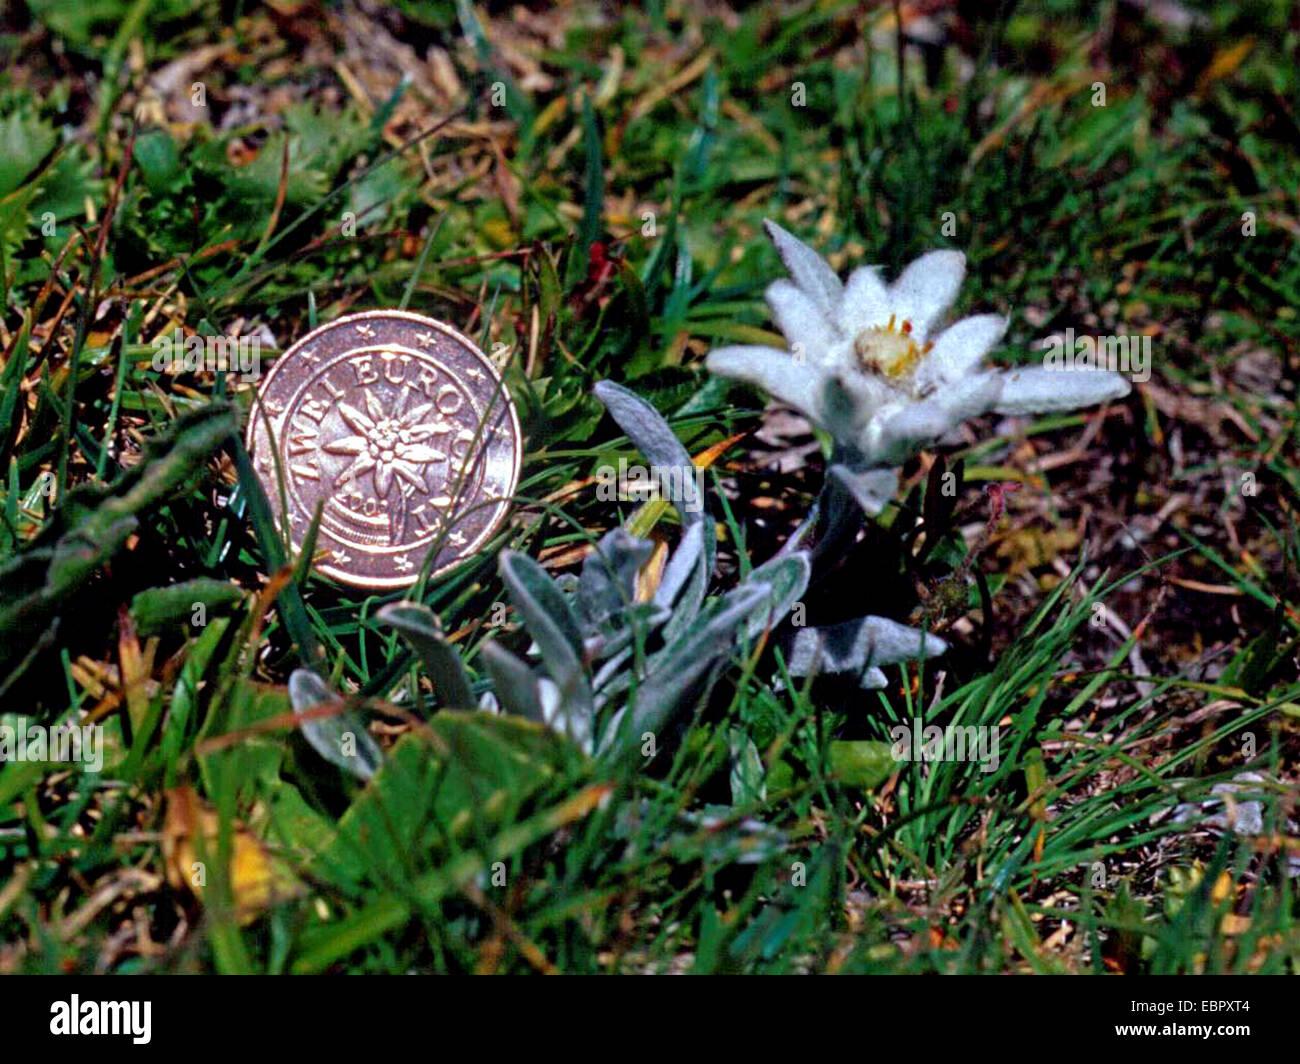 Edelweiß Leontopodium Alpinum Leontopodium Nivale Blühen Neben